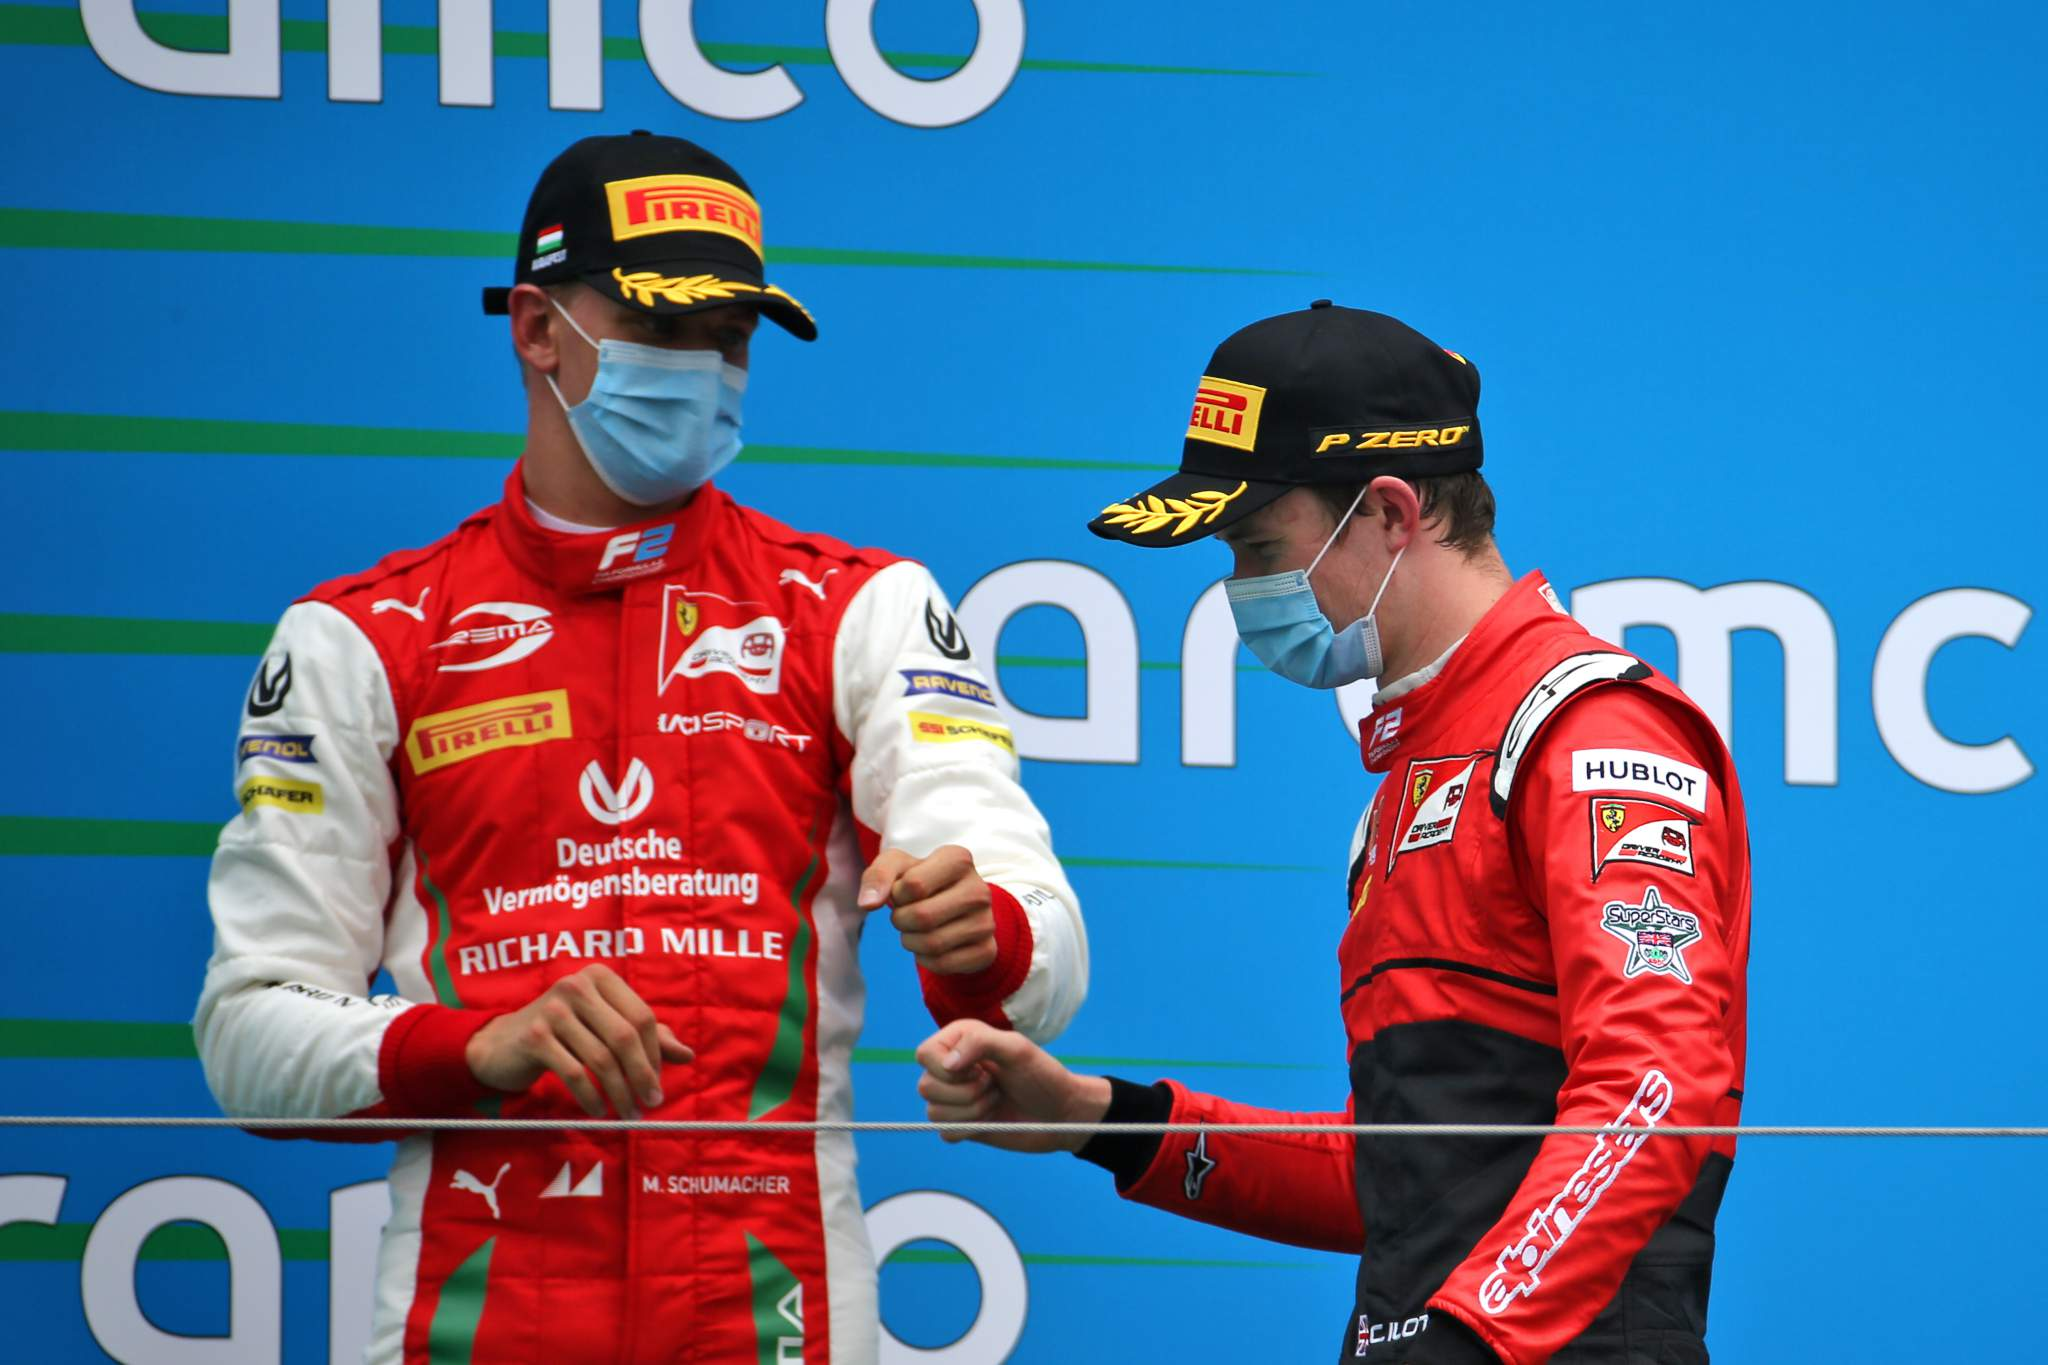 Motor Racing Fia Formula 2 Championship Sunday Budapest, Hungary